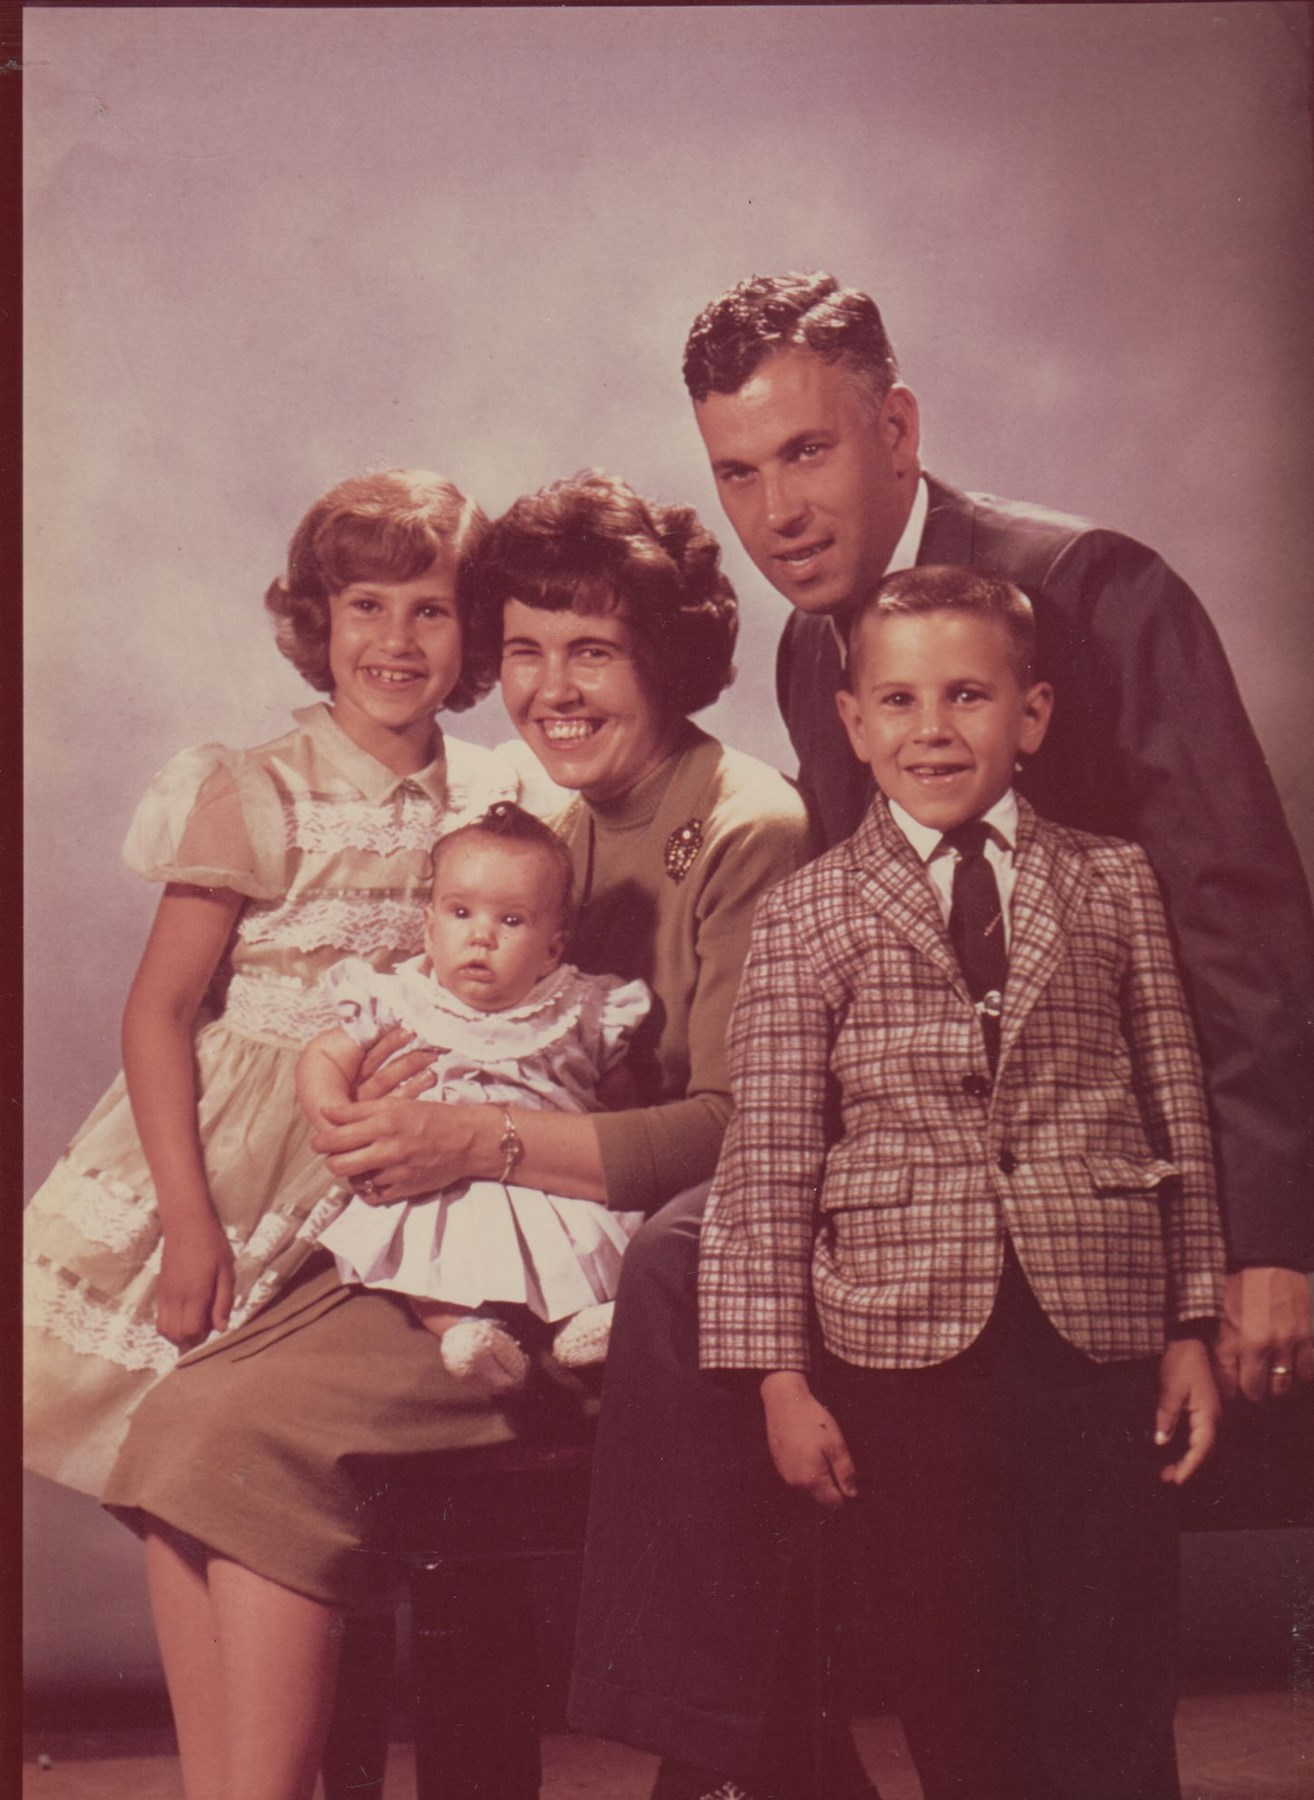 Gracie Allen,Fiona Hogan Hot clip Erica Hubbard,Beatrice Arthur born May 13, 1922 (age 96)